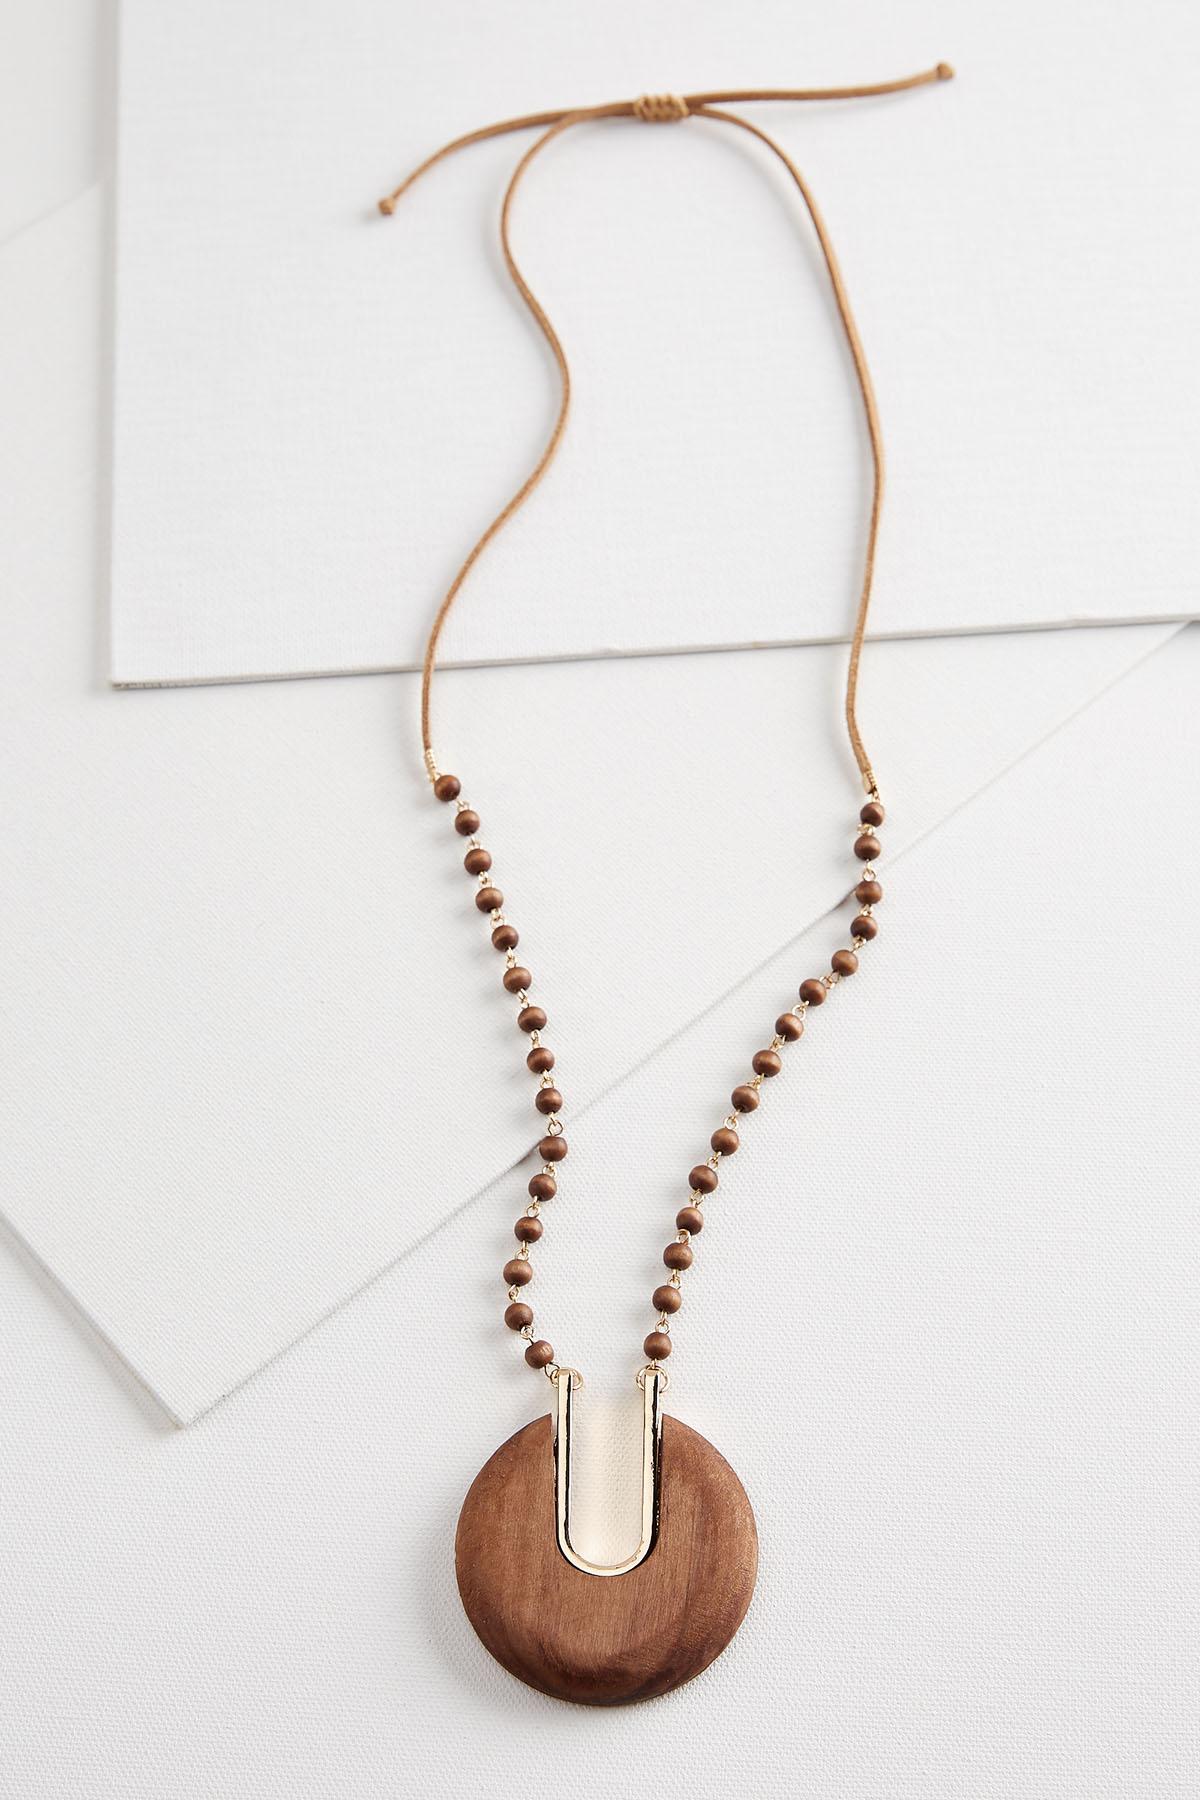 Wooden Boho Necklace